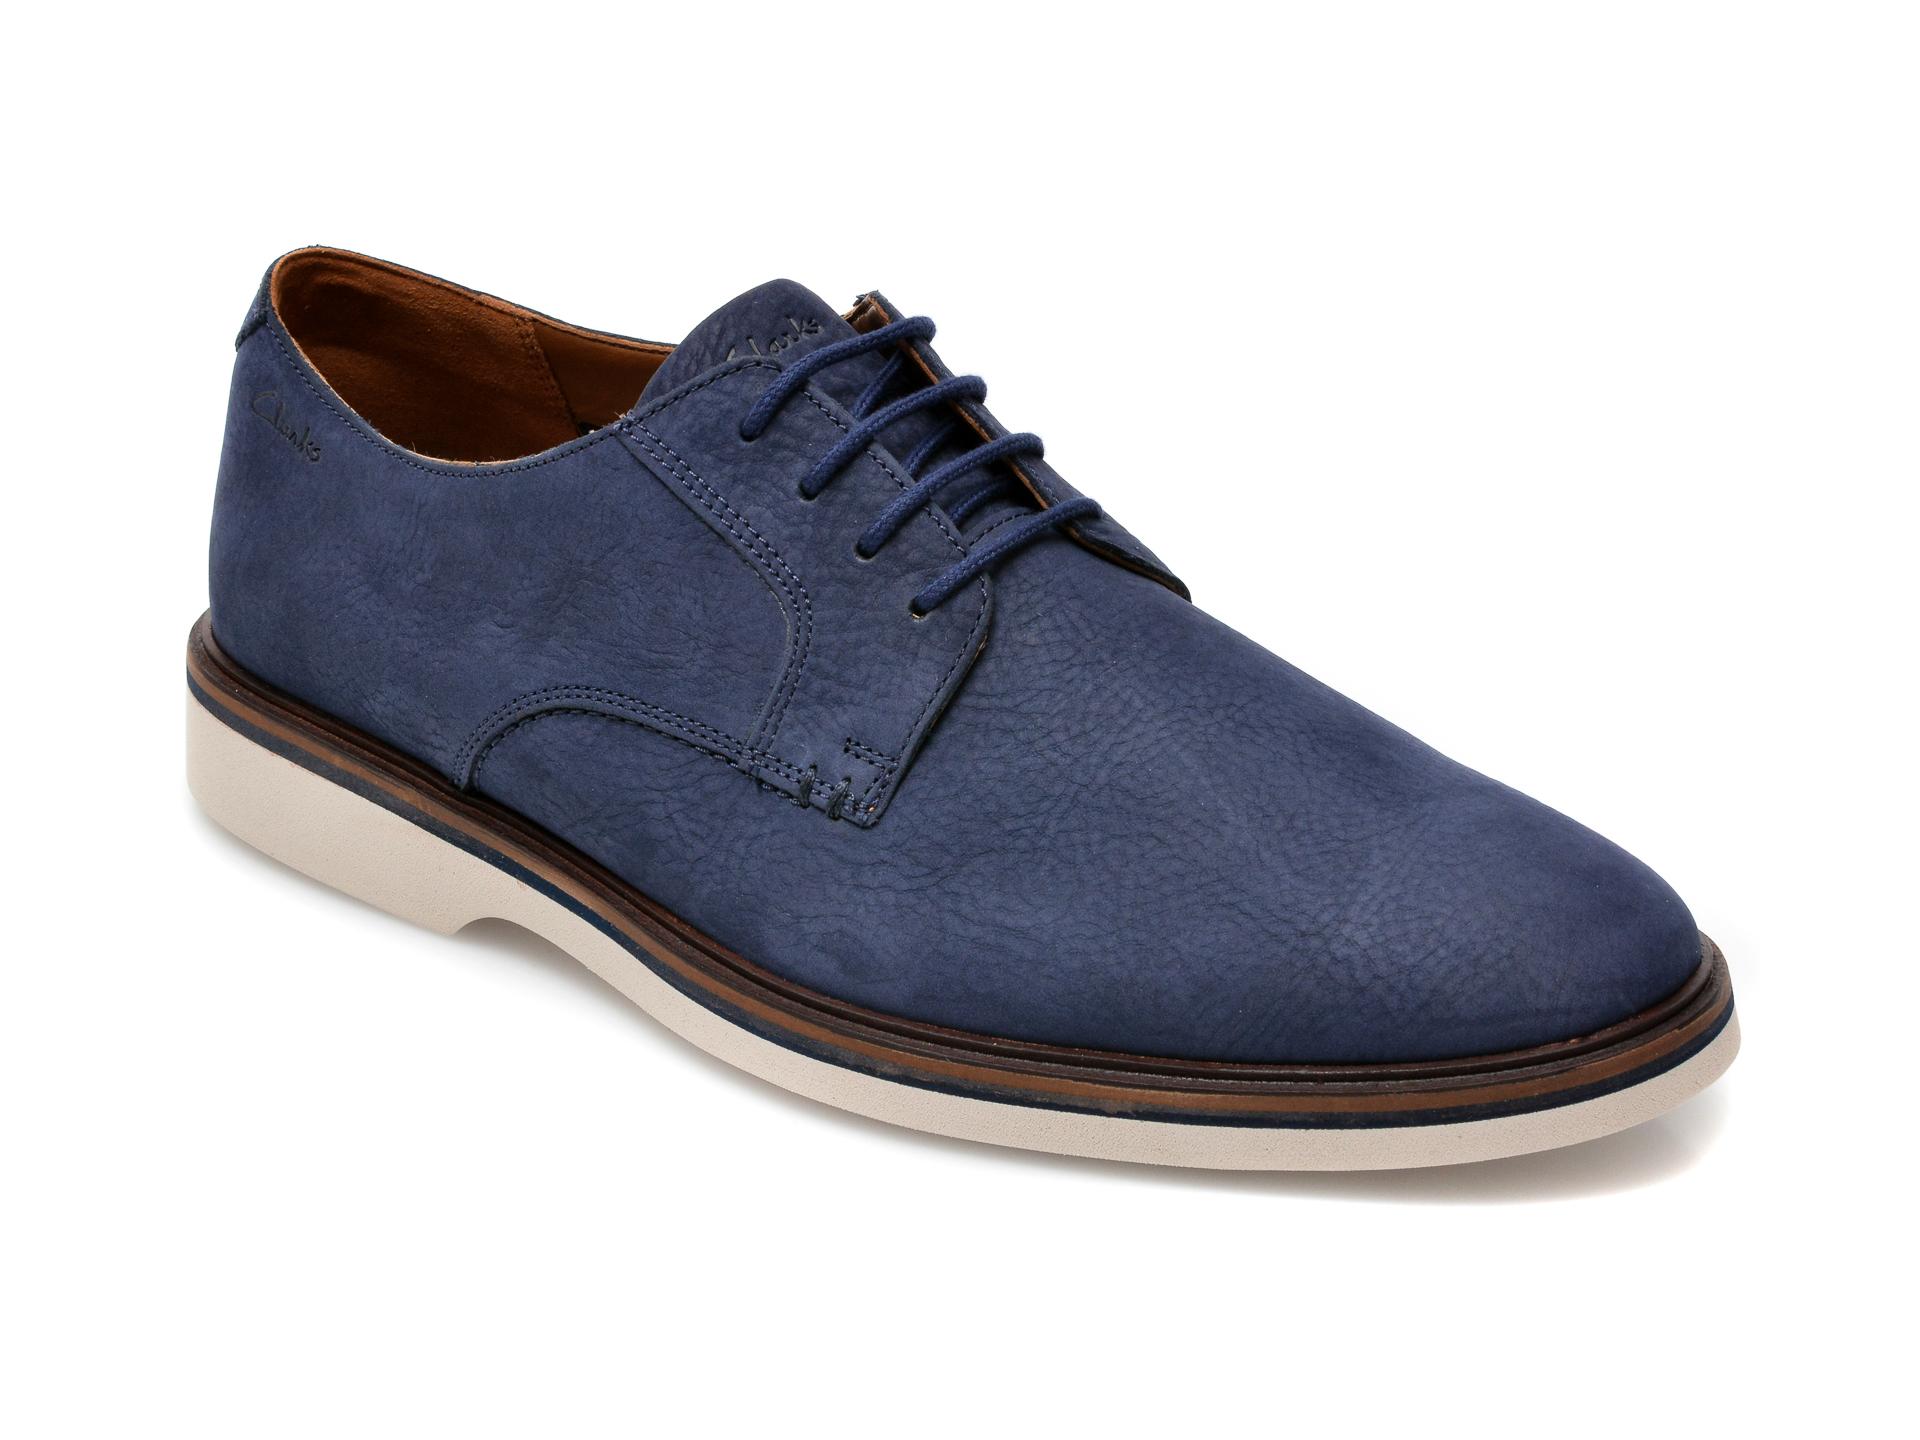 Pantofi CLARKS bleumarin, Stafford Park5, din nabuc